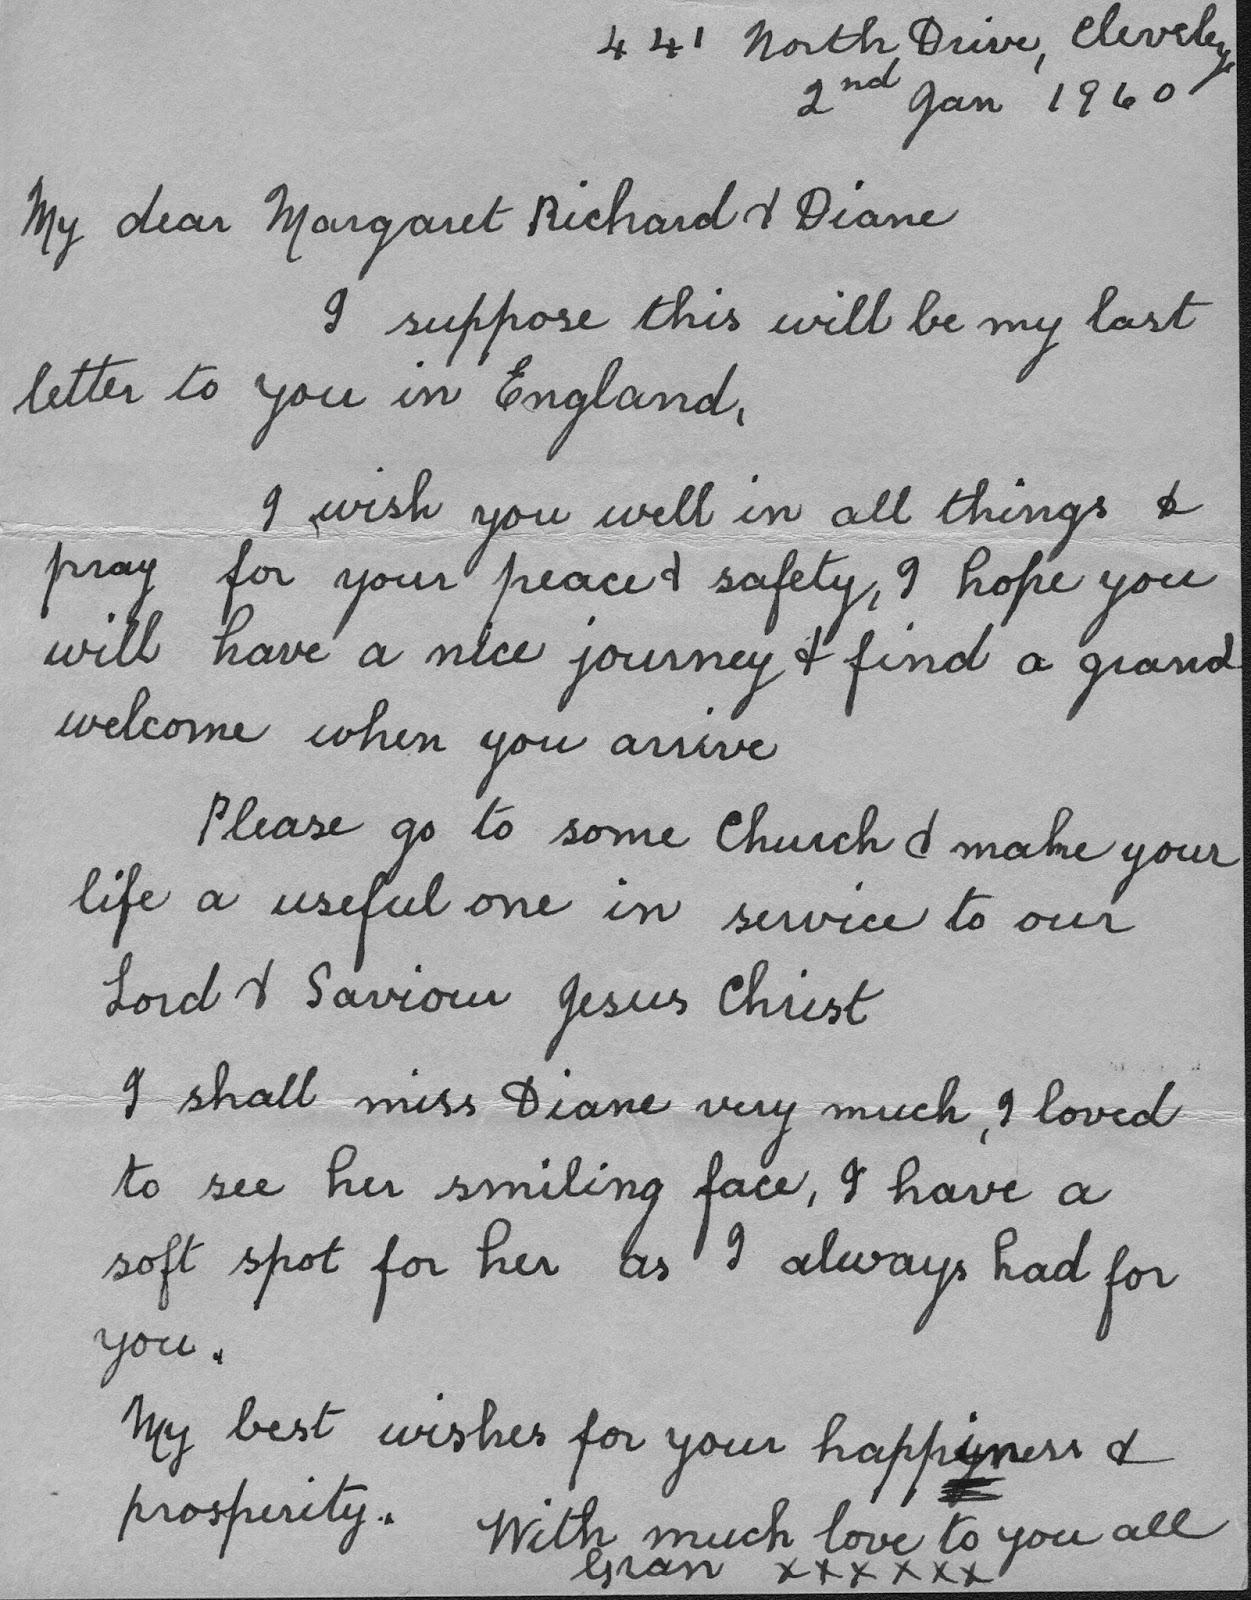 Famous quotes about cursive handwriting quotesgram